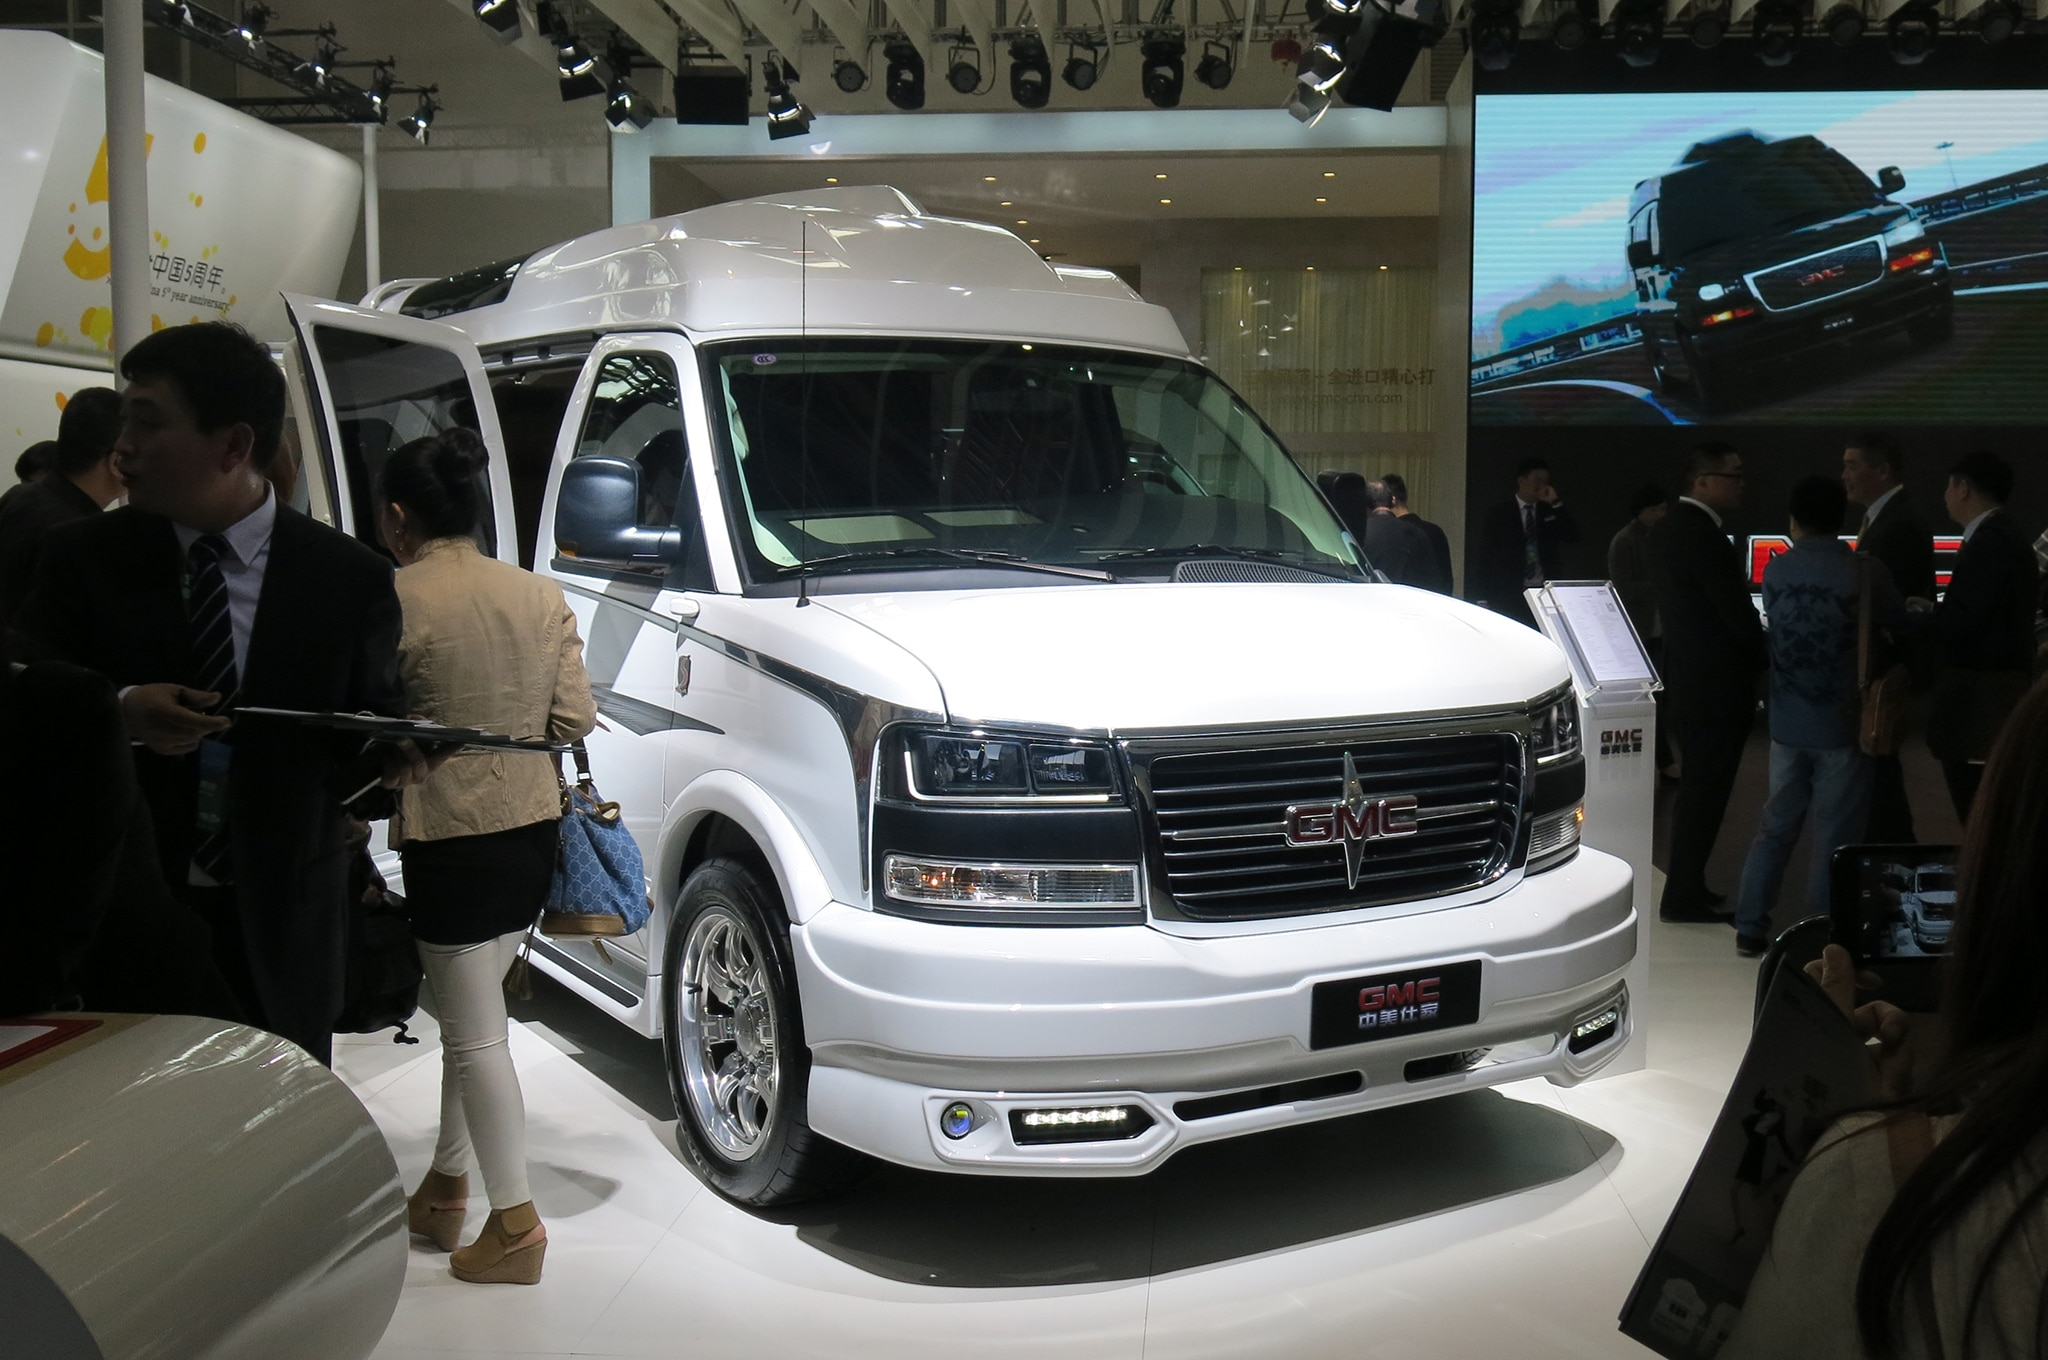 Sprinter Conversion Van >> 2014 Beijing Auto Show Hits, Misses and Revelations - Automobile